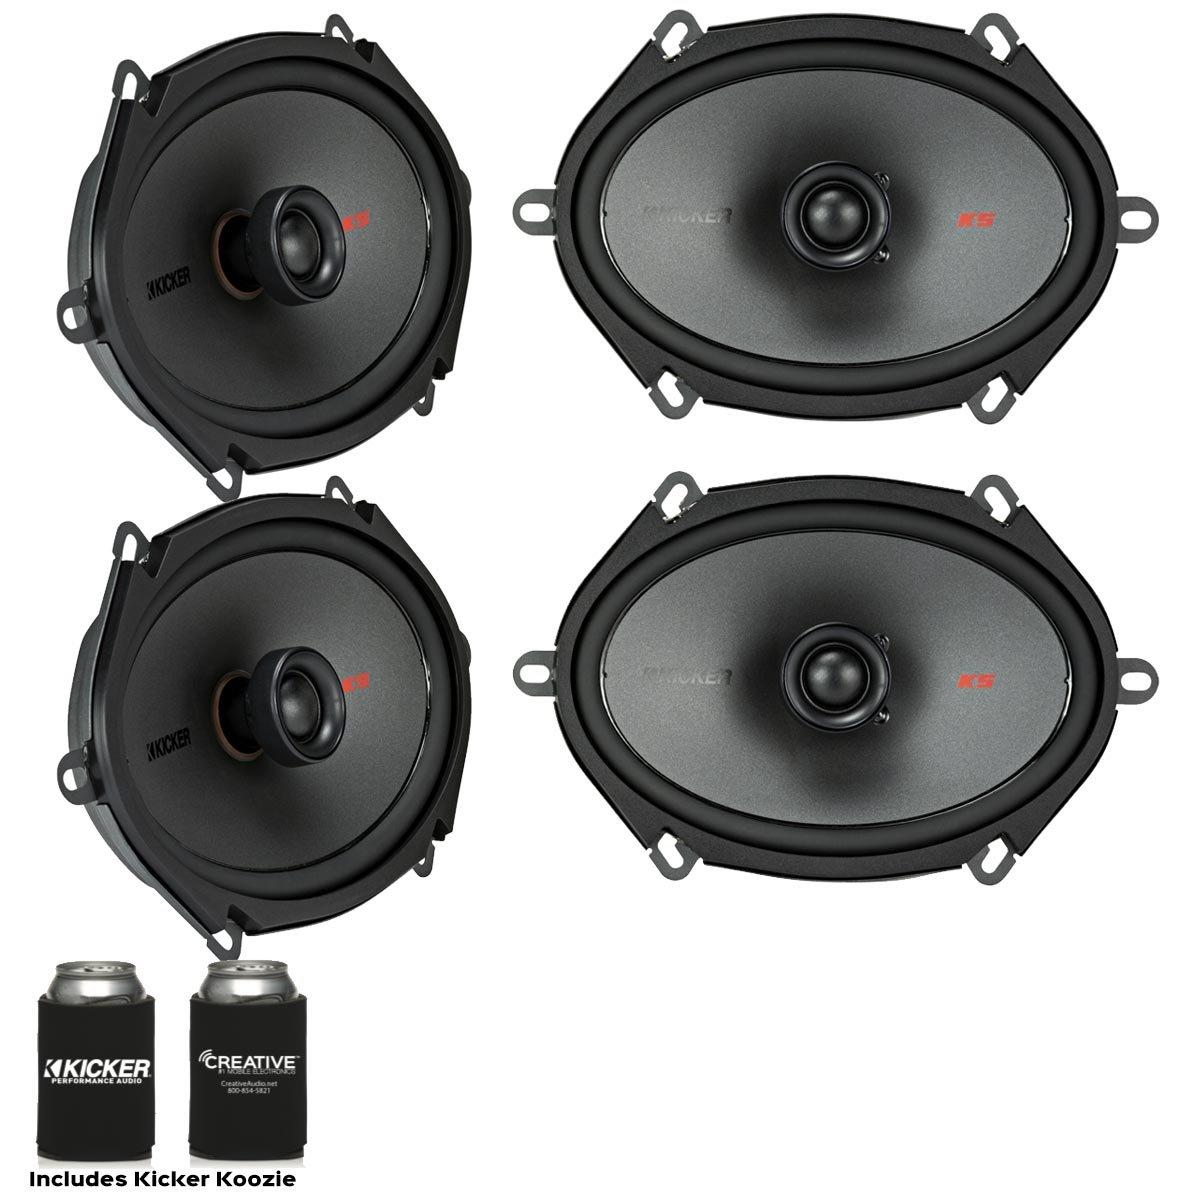 Kicker Speaker Bundle - Two pairs of Kicker 6x8 Inch KS-Series Speakers 44KSC6804 by Kicker